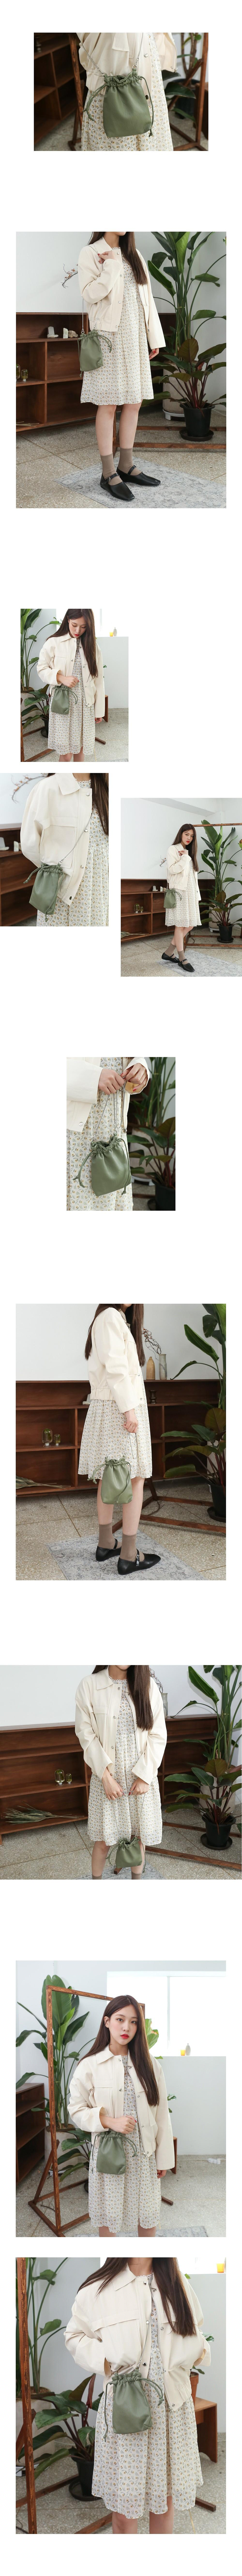 Lucky mini leather bag